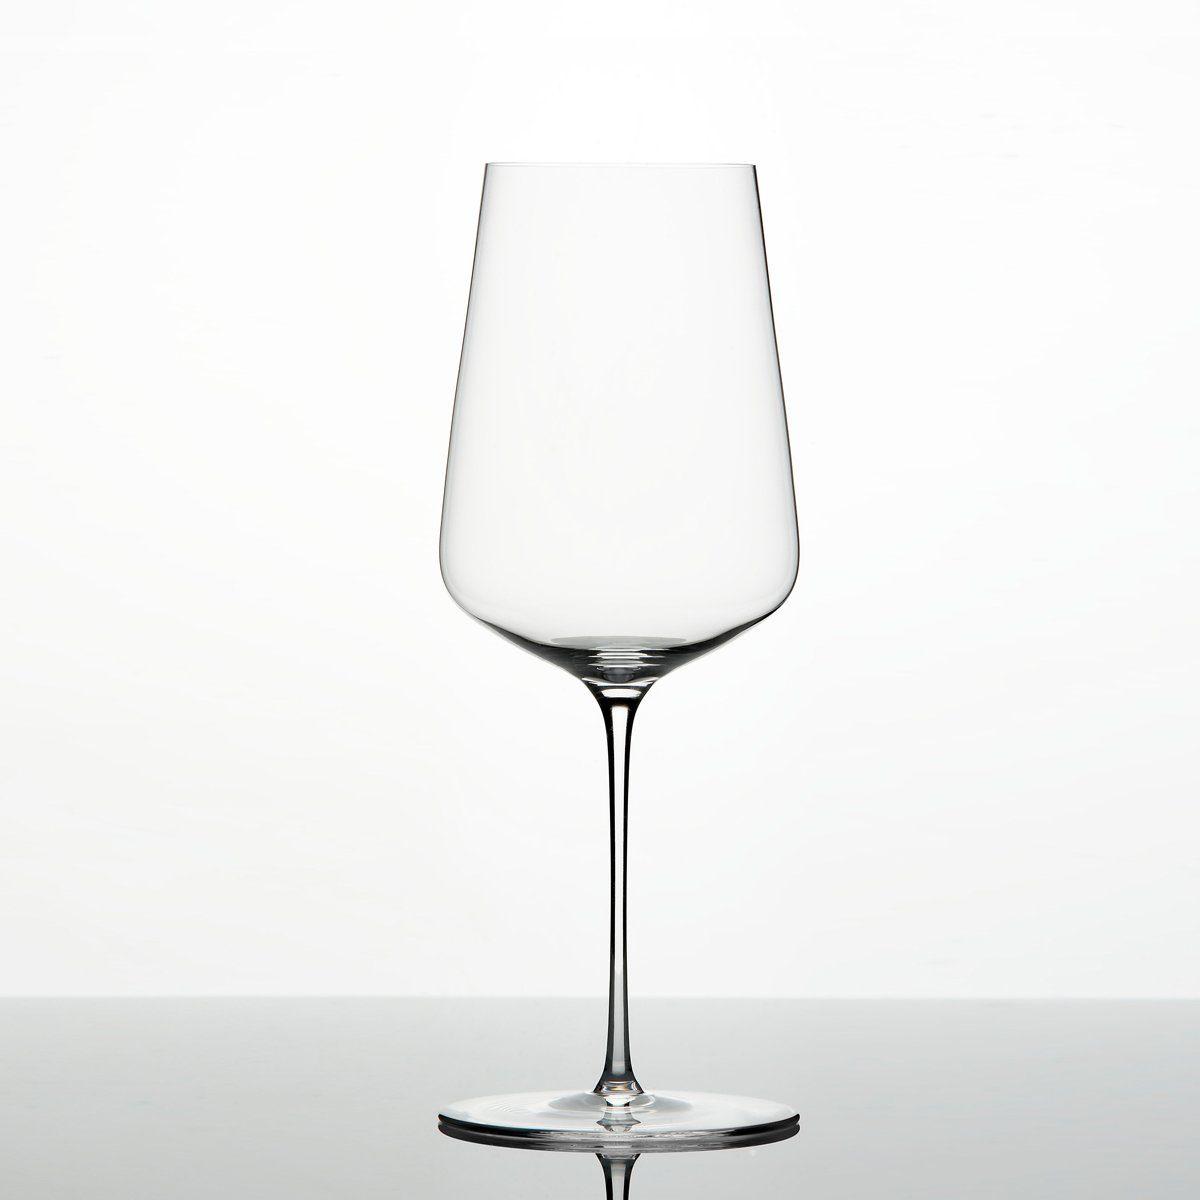 Zalto Zalto Universalweinglas, mundgeblasen, 6 Stück